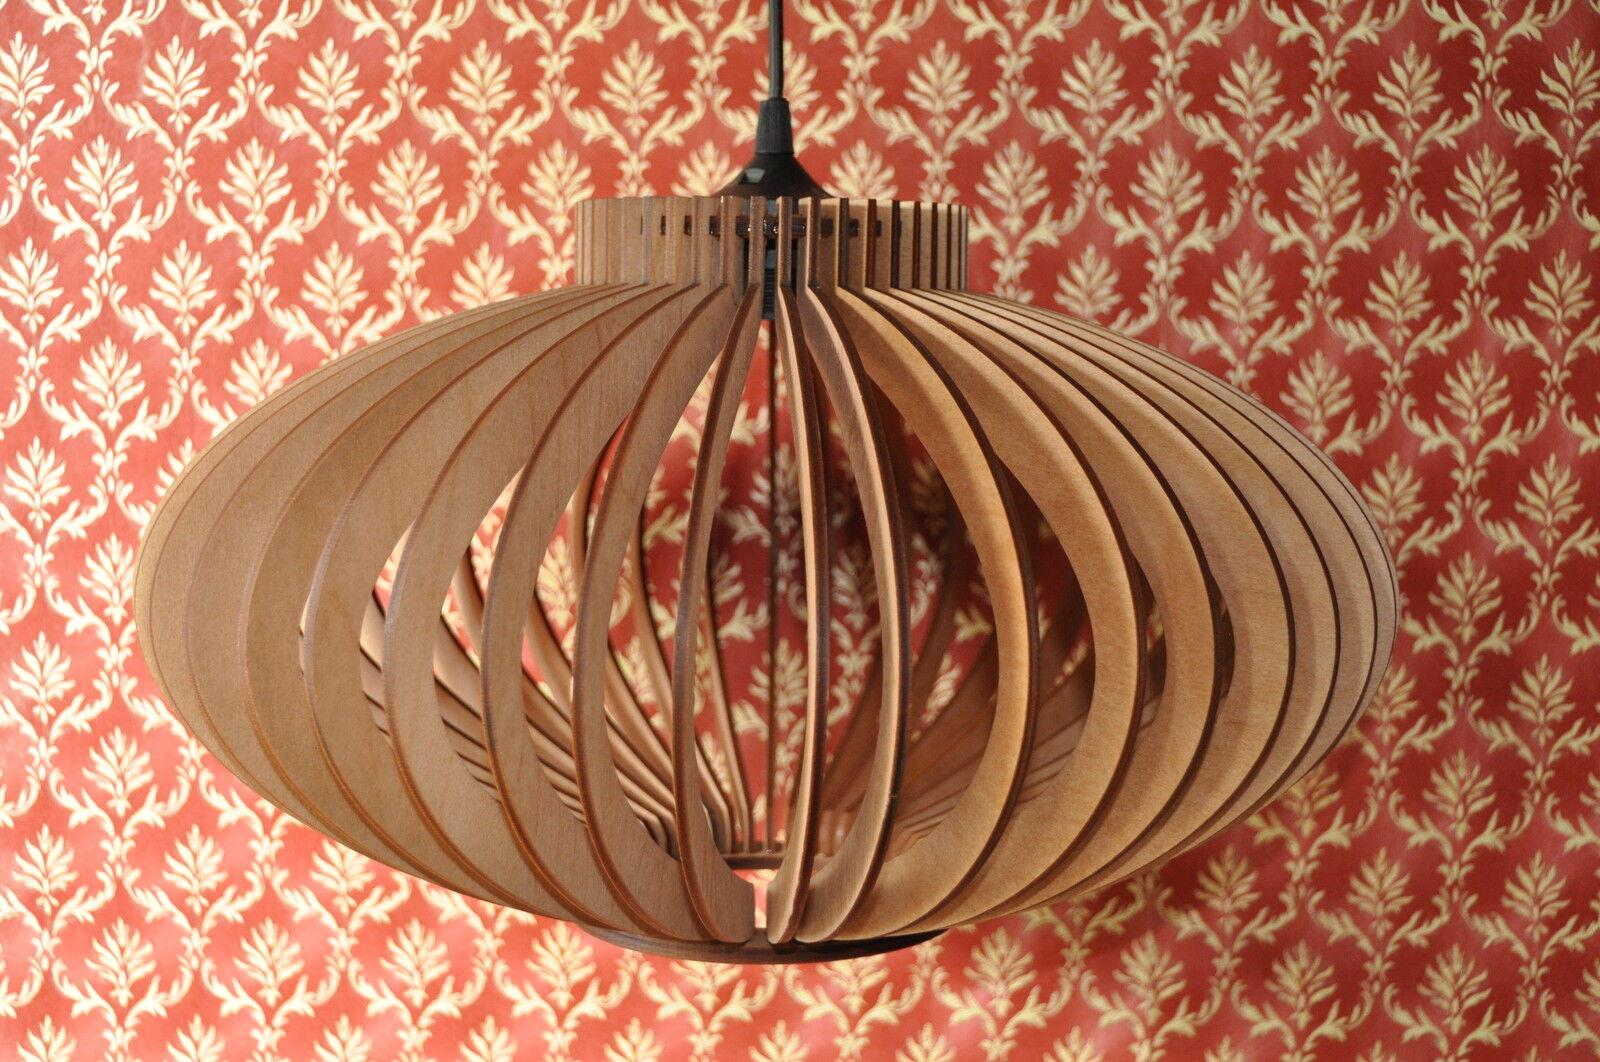 h ngeleuchte pendelleuchte deckenlampe modern k che wohnzimmer holz neu eur 135 00 picclick at. Black Bedroom Furniture Sets. Home Design Ideas